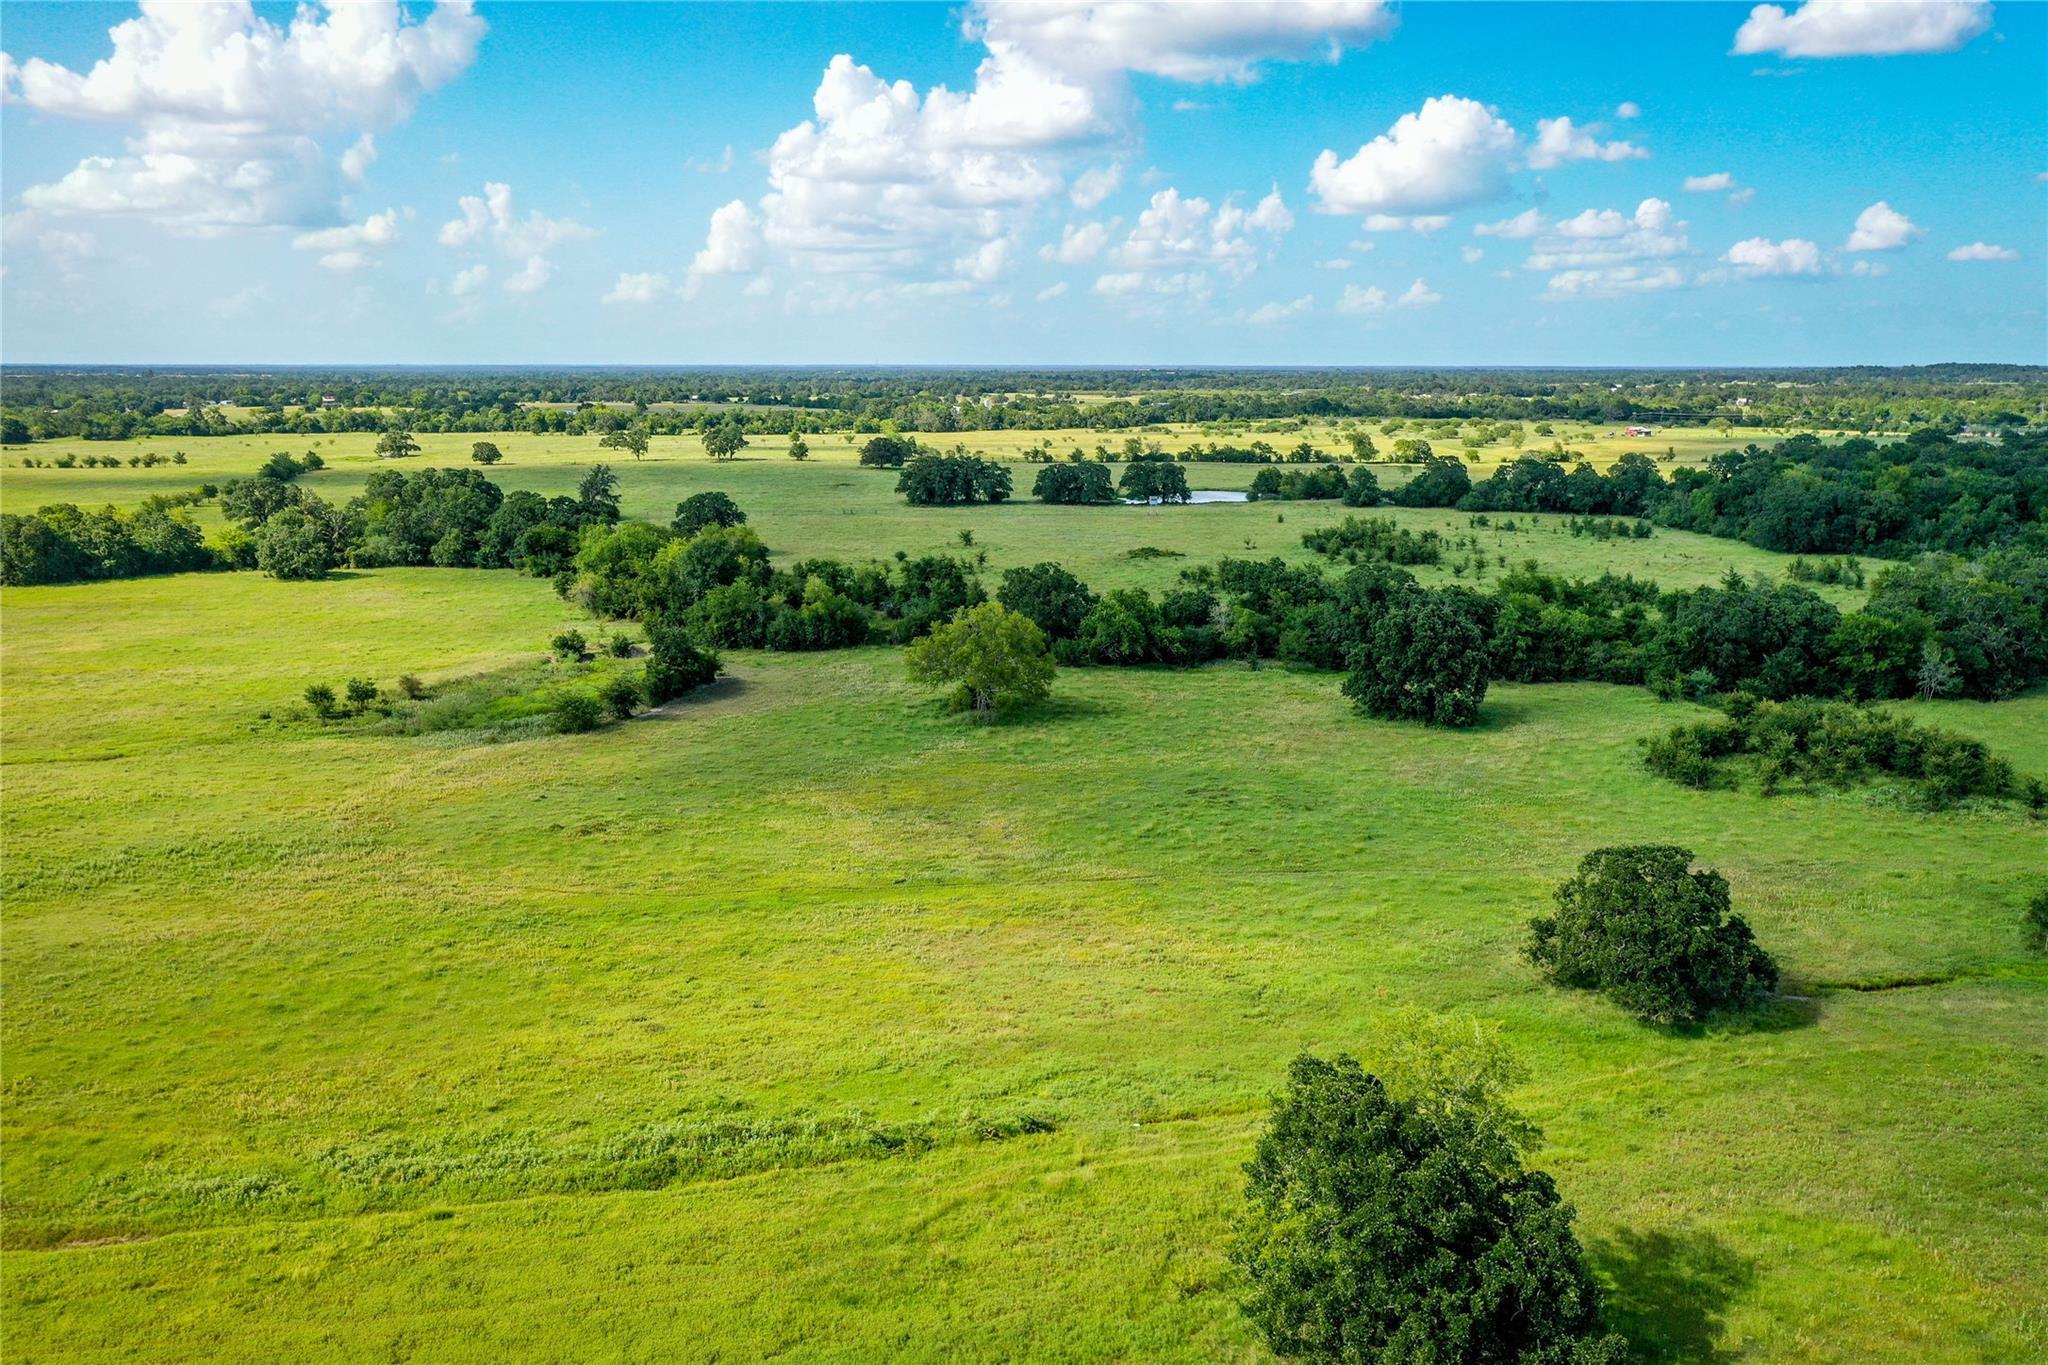 22130 FM 2620 Property Photo - Bedias, TX real estate listing